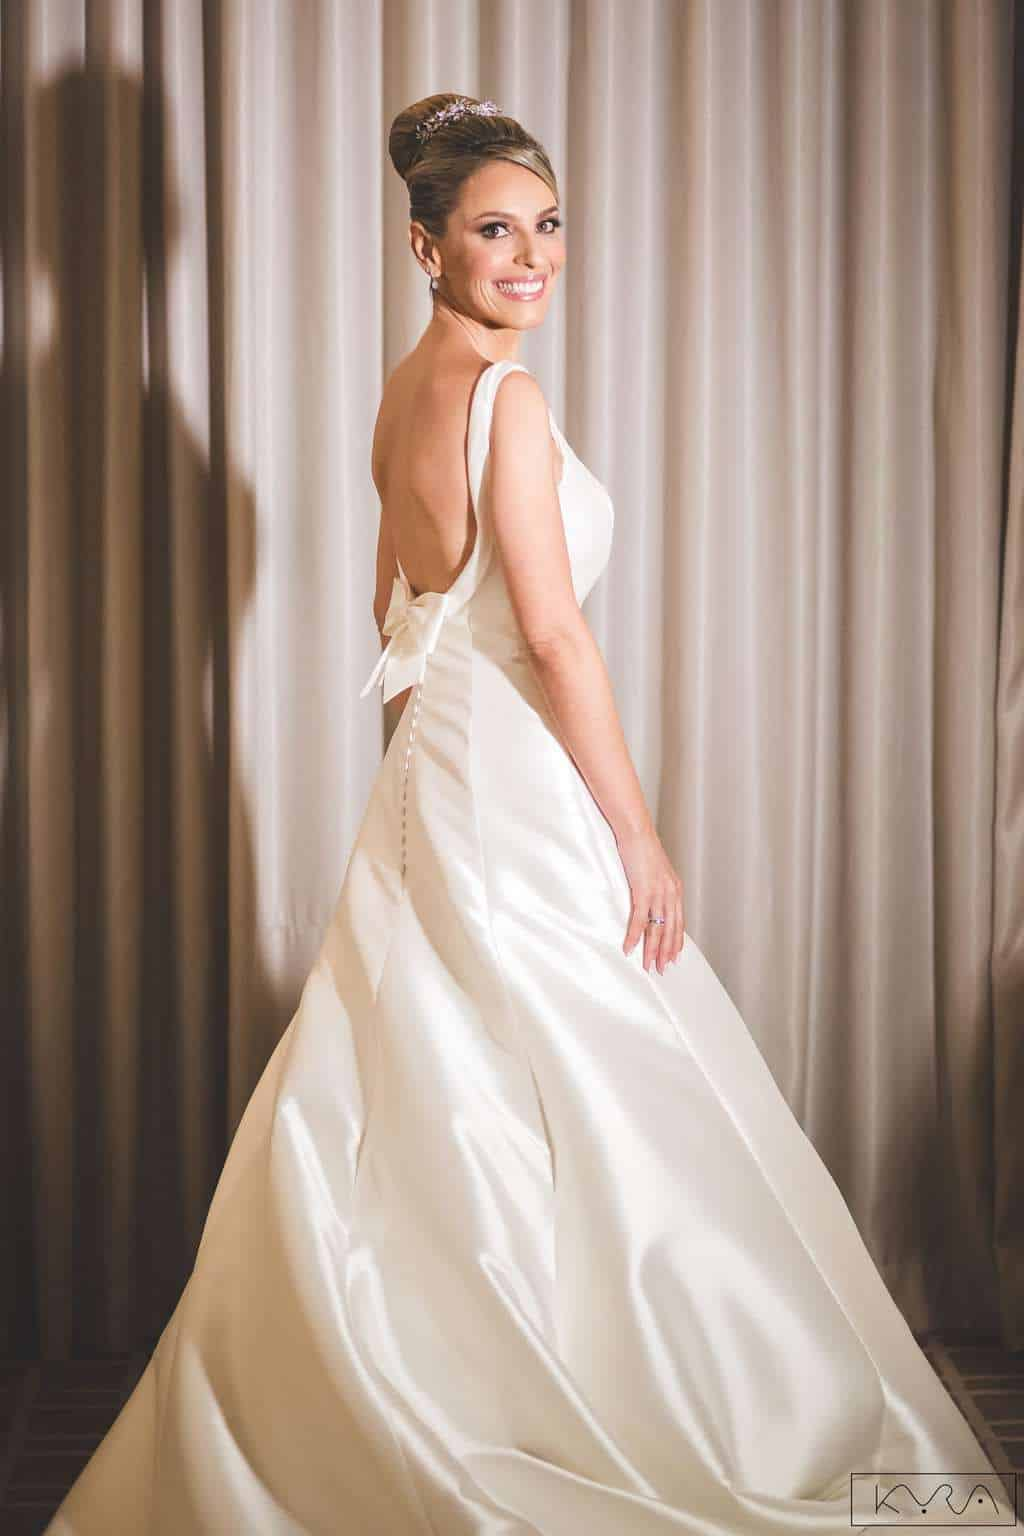 ana-carolina-e-bernardo-Anna-Carolina-Werneck-beleza-da-noiva-casamento-tradicional-Gavea-Golf-Club-Kyra-Mirsky-look-making-of-mini-wedding-noiva-verde-e-rosa-vestido-de-noiva-casamento-56